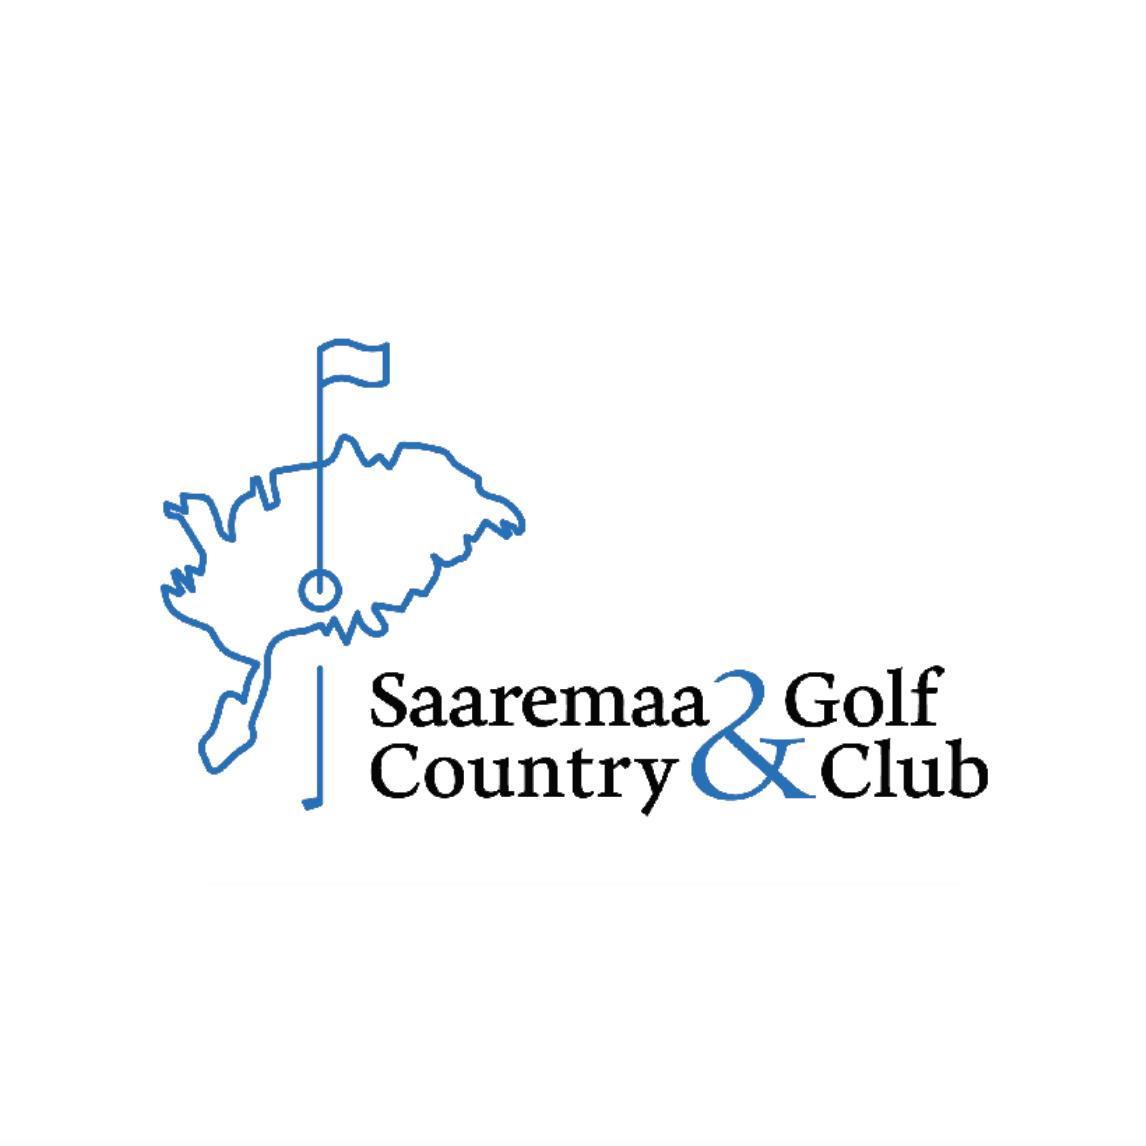 Saaremaa Golf & Country Club